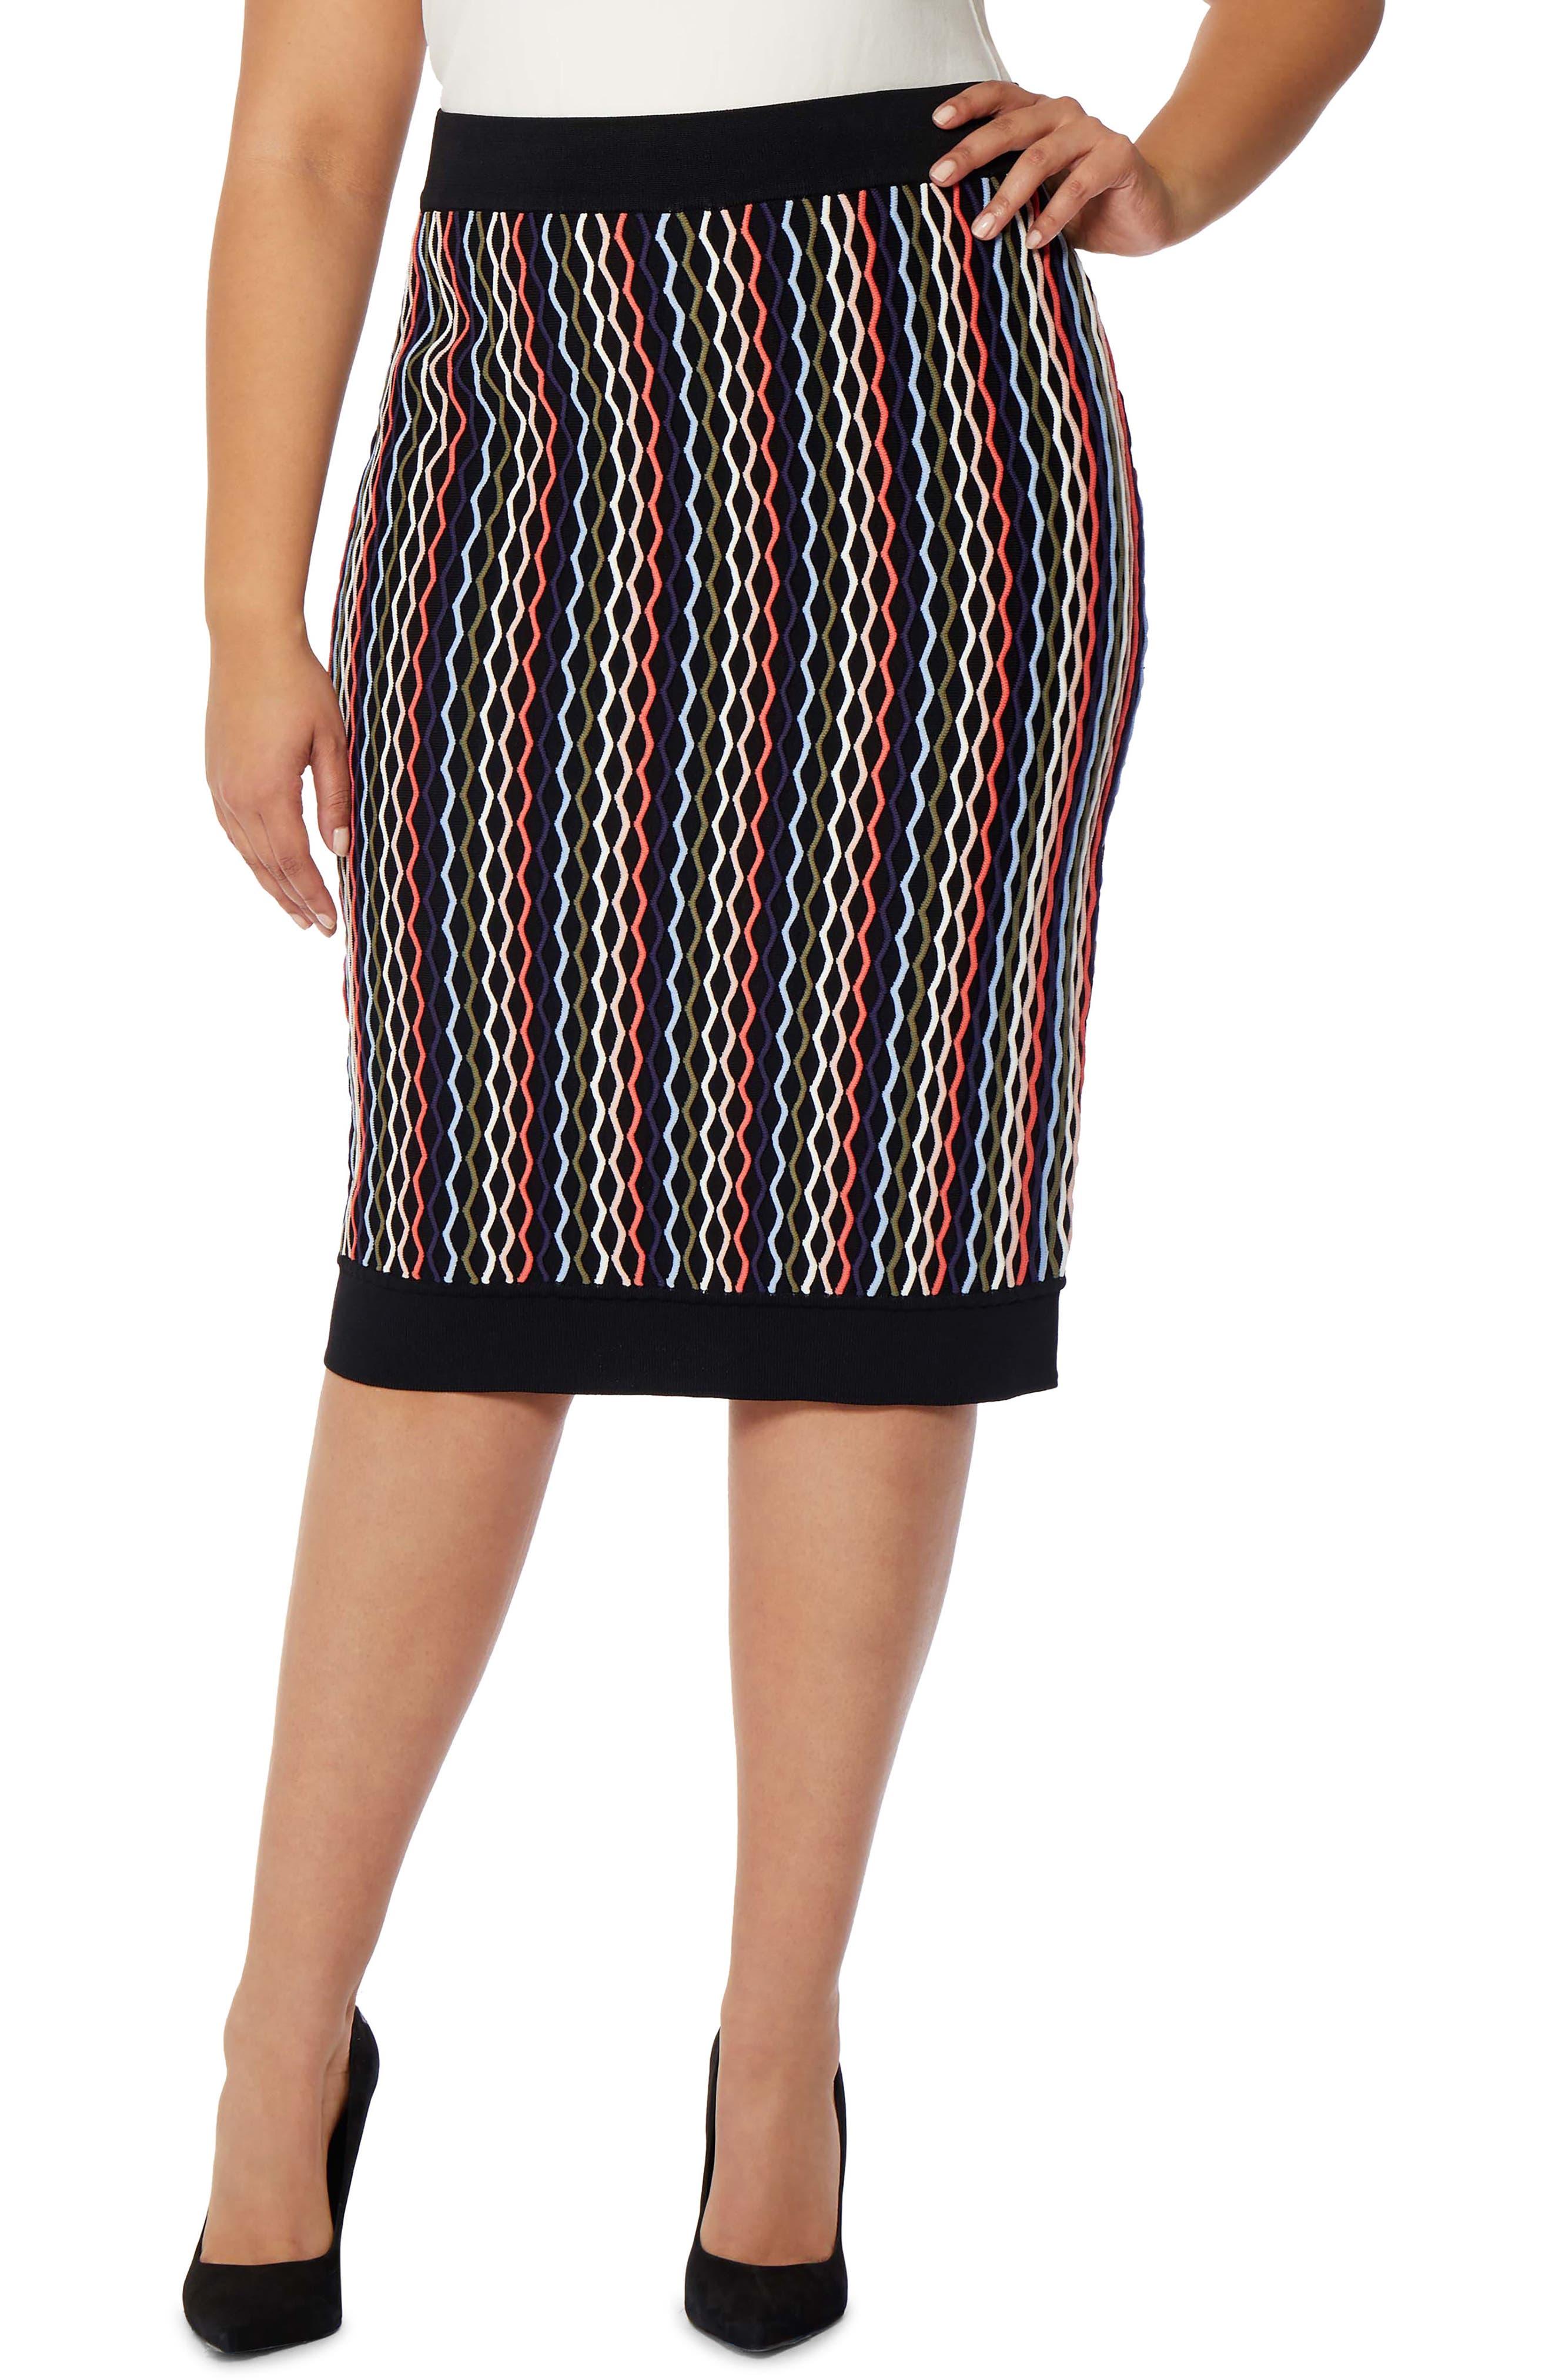 Rebel Wilson x Angels Textured Pattern Pencil Skirt (Plus Size)